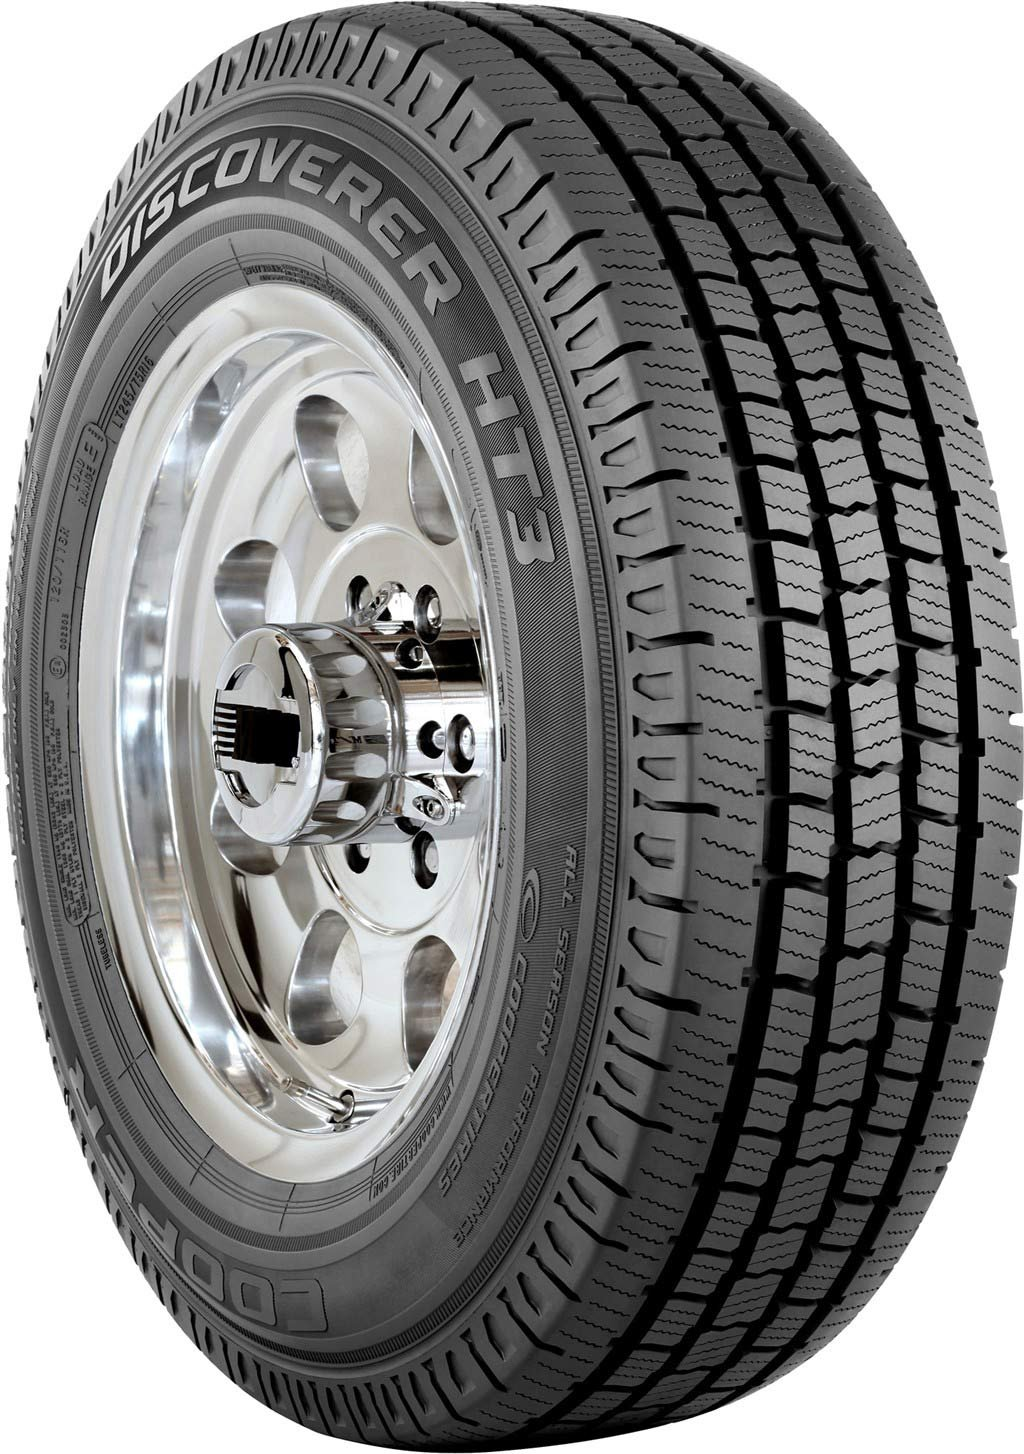 Season Radial Tire-225//75R16 112R Cooper Discoverer HT3 All